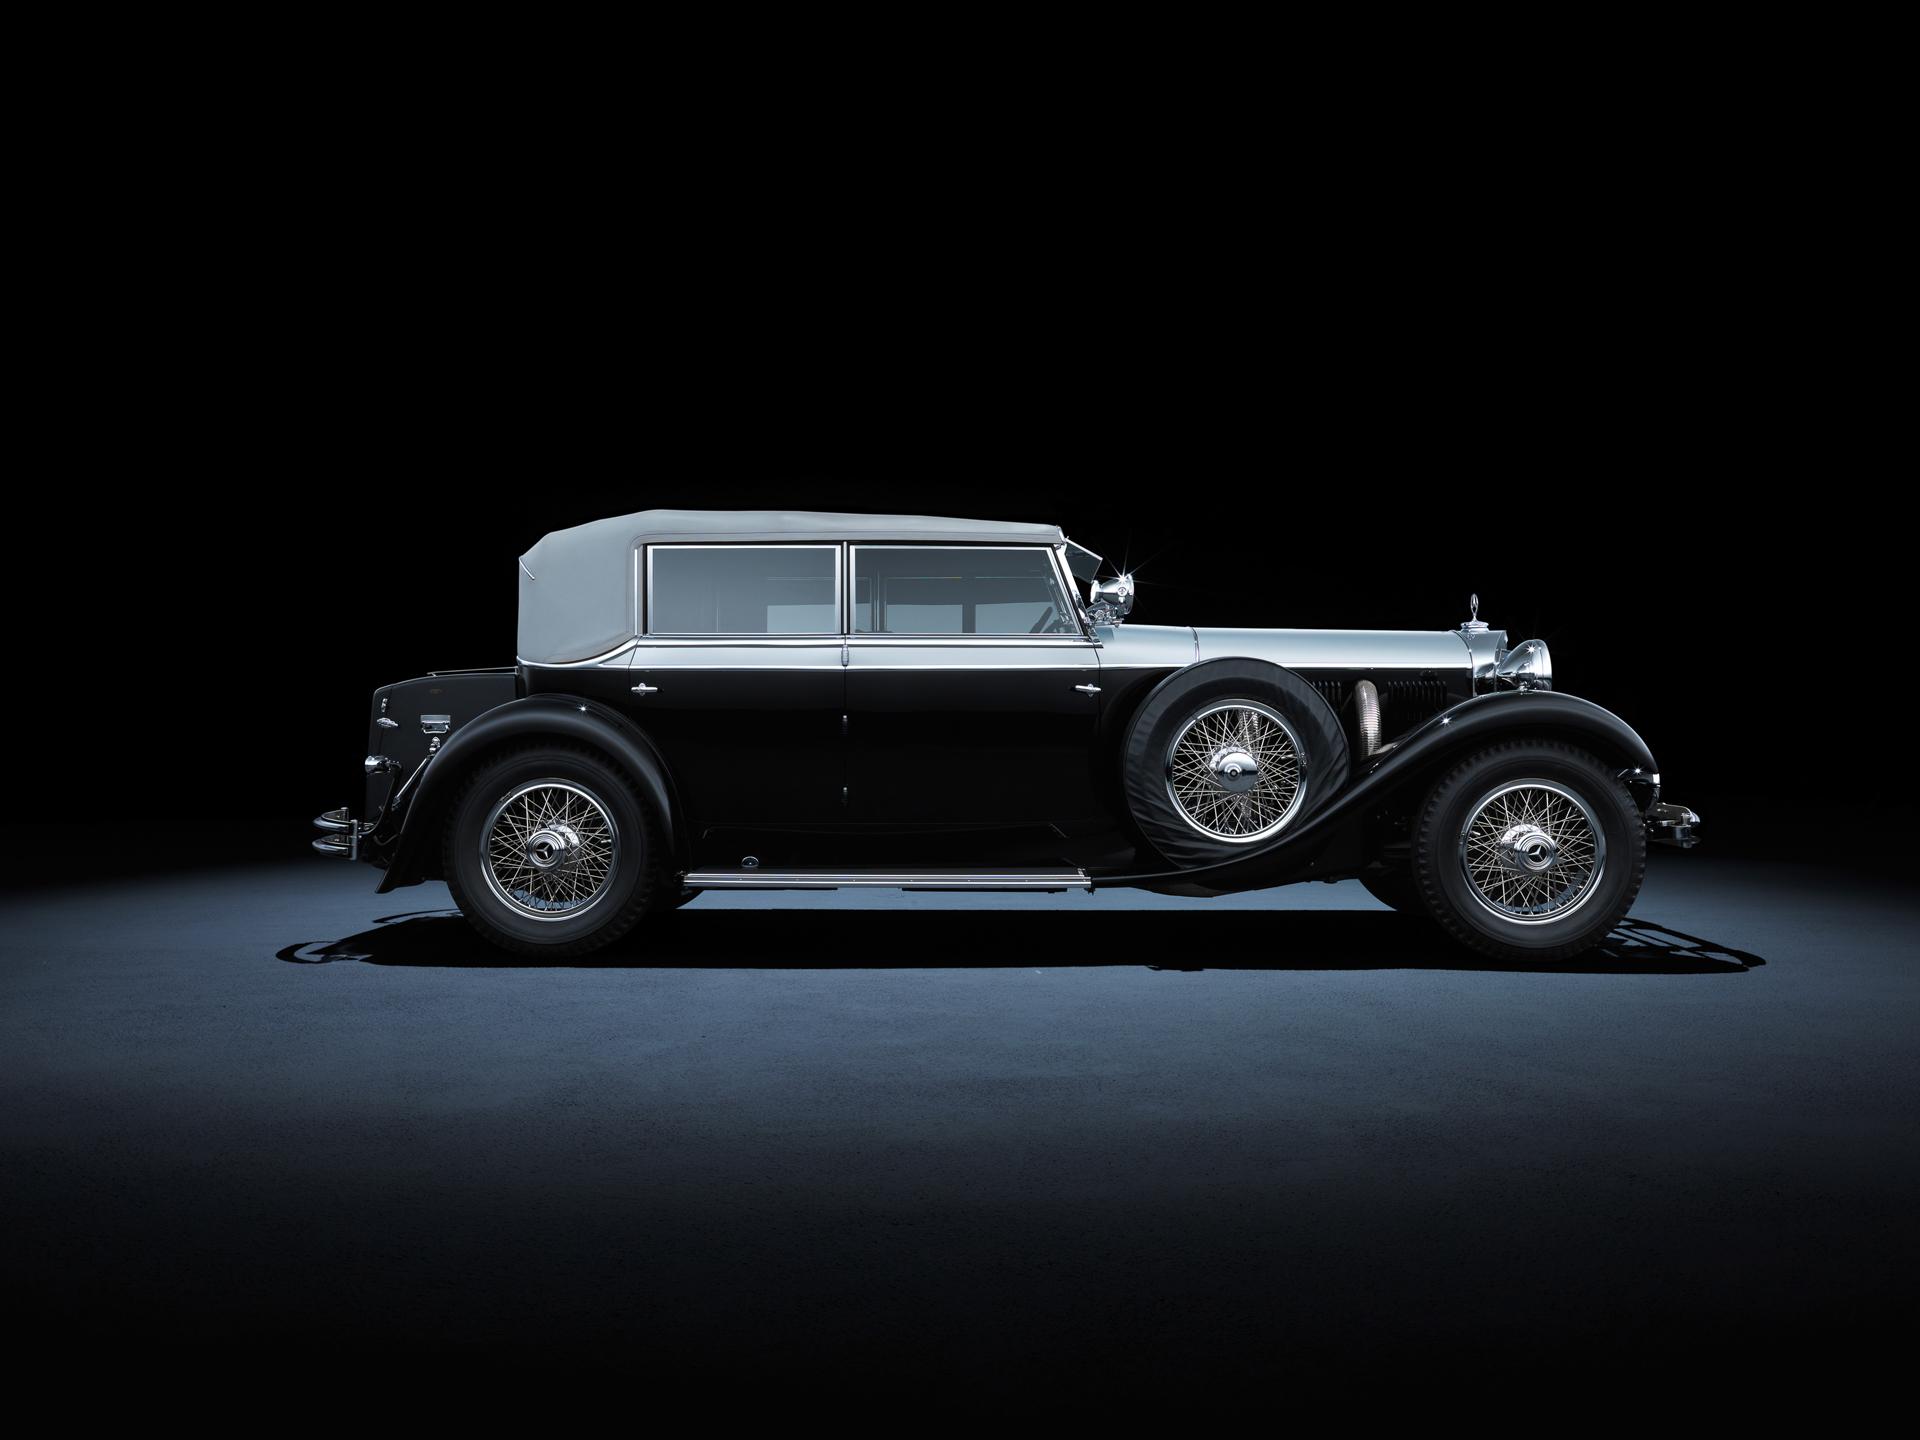 Remote Control Car Wallpaper 1931 Mercedes Benz 770k History Pictures Value Auction